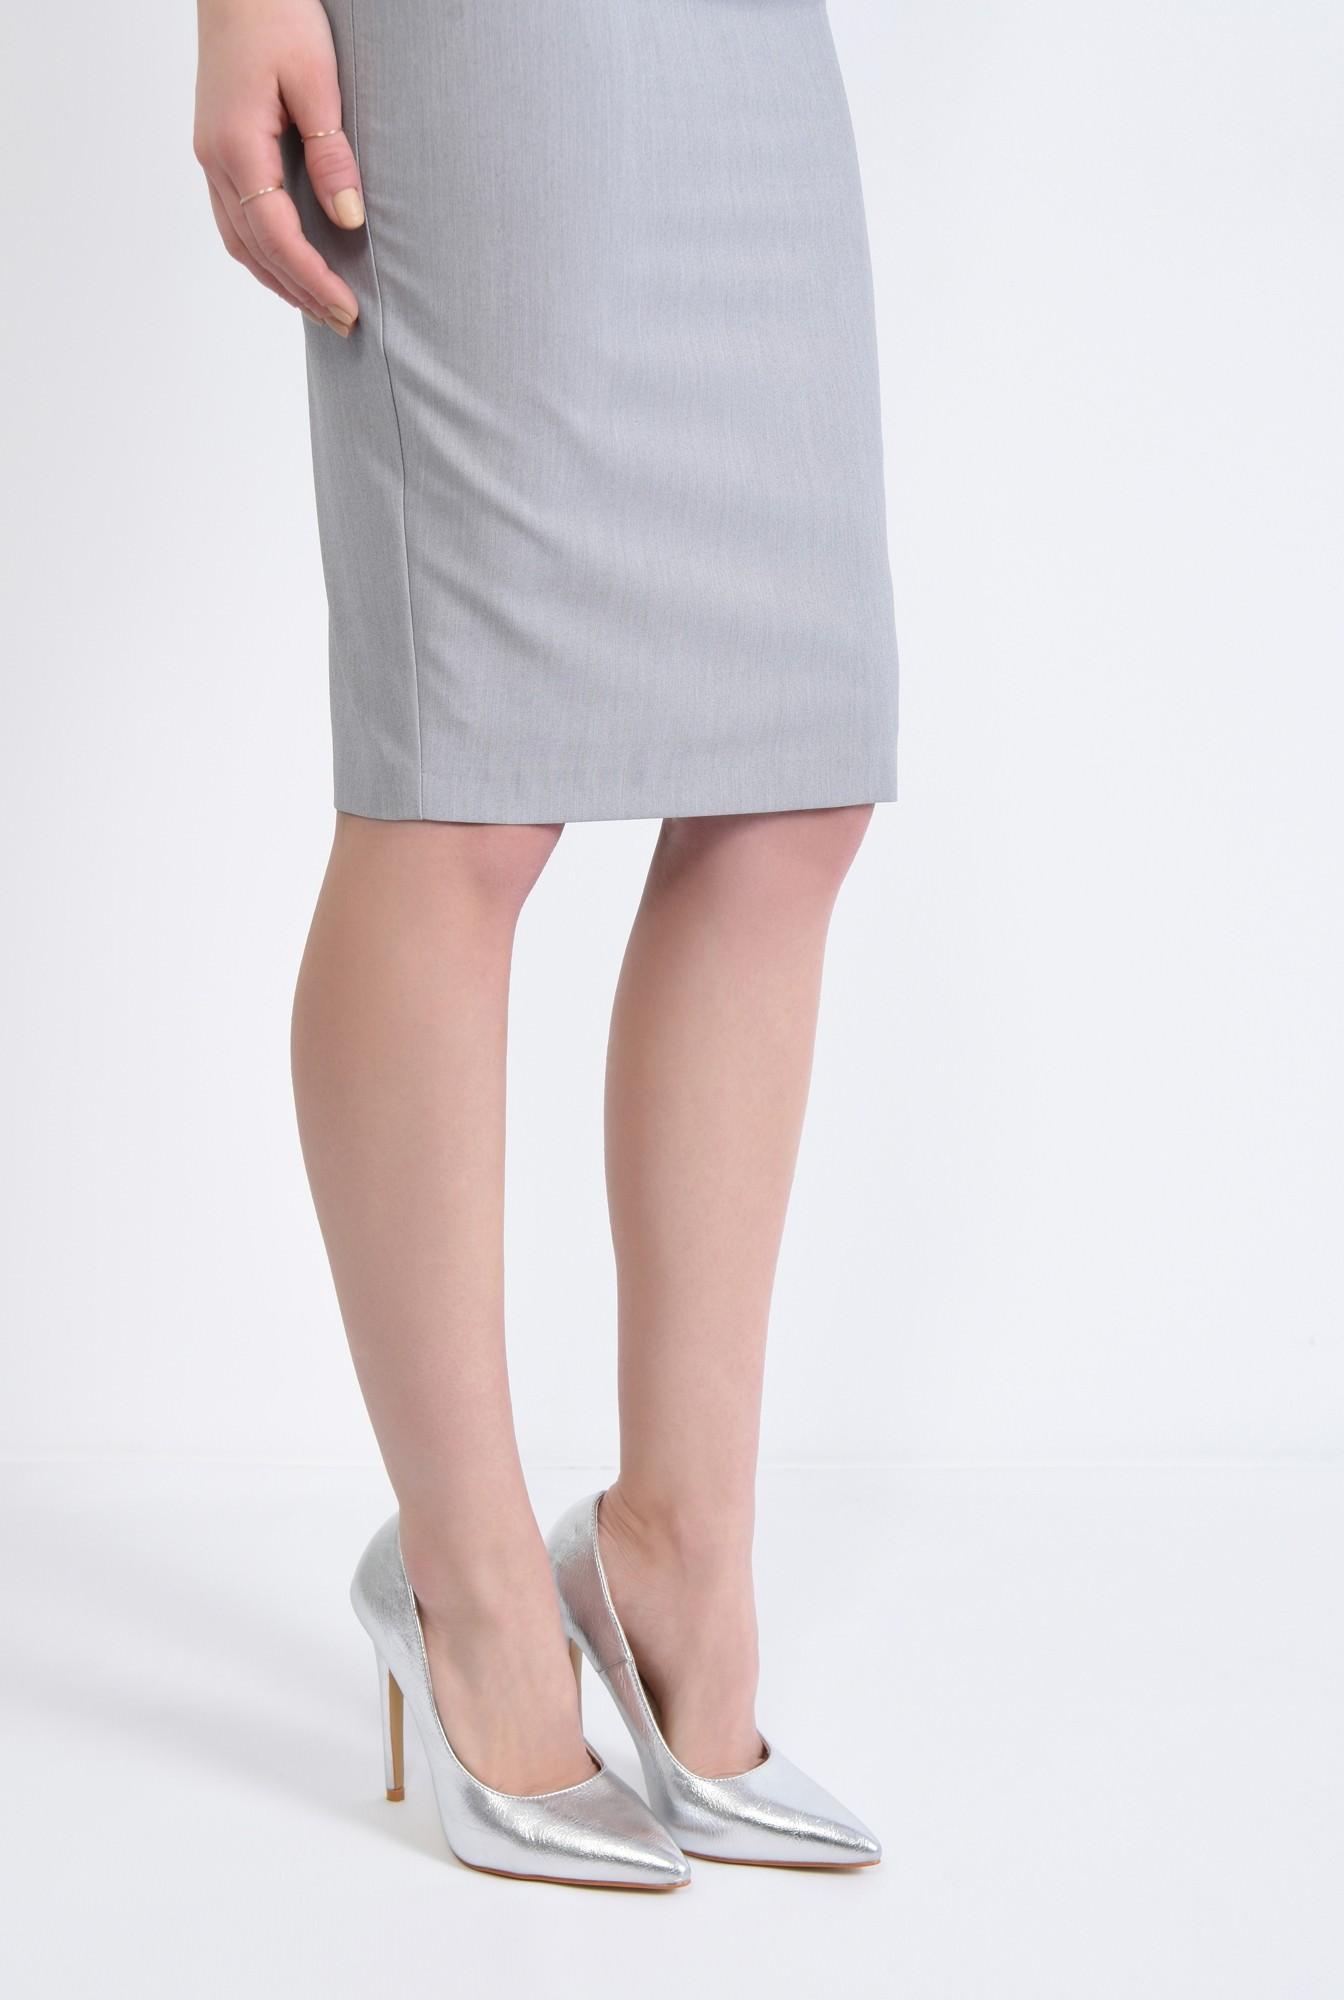 4 - pantofi dama, stiletto, argintiu, metalic